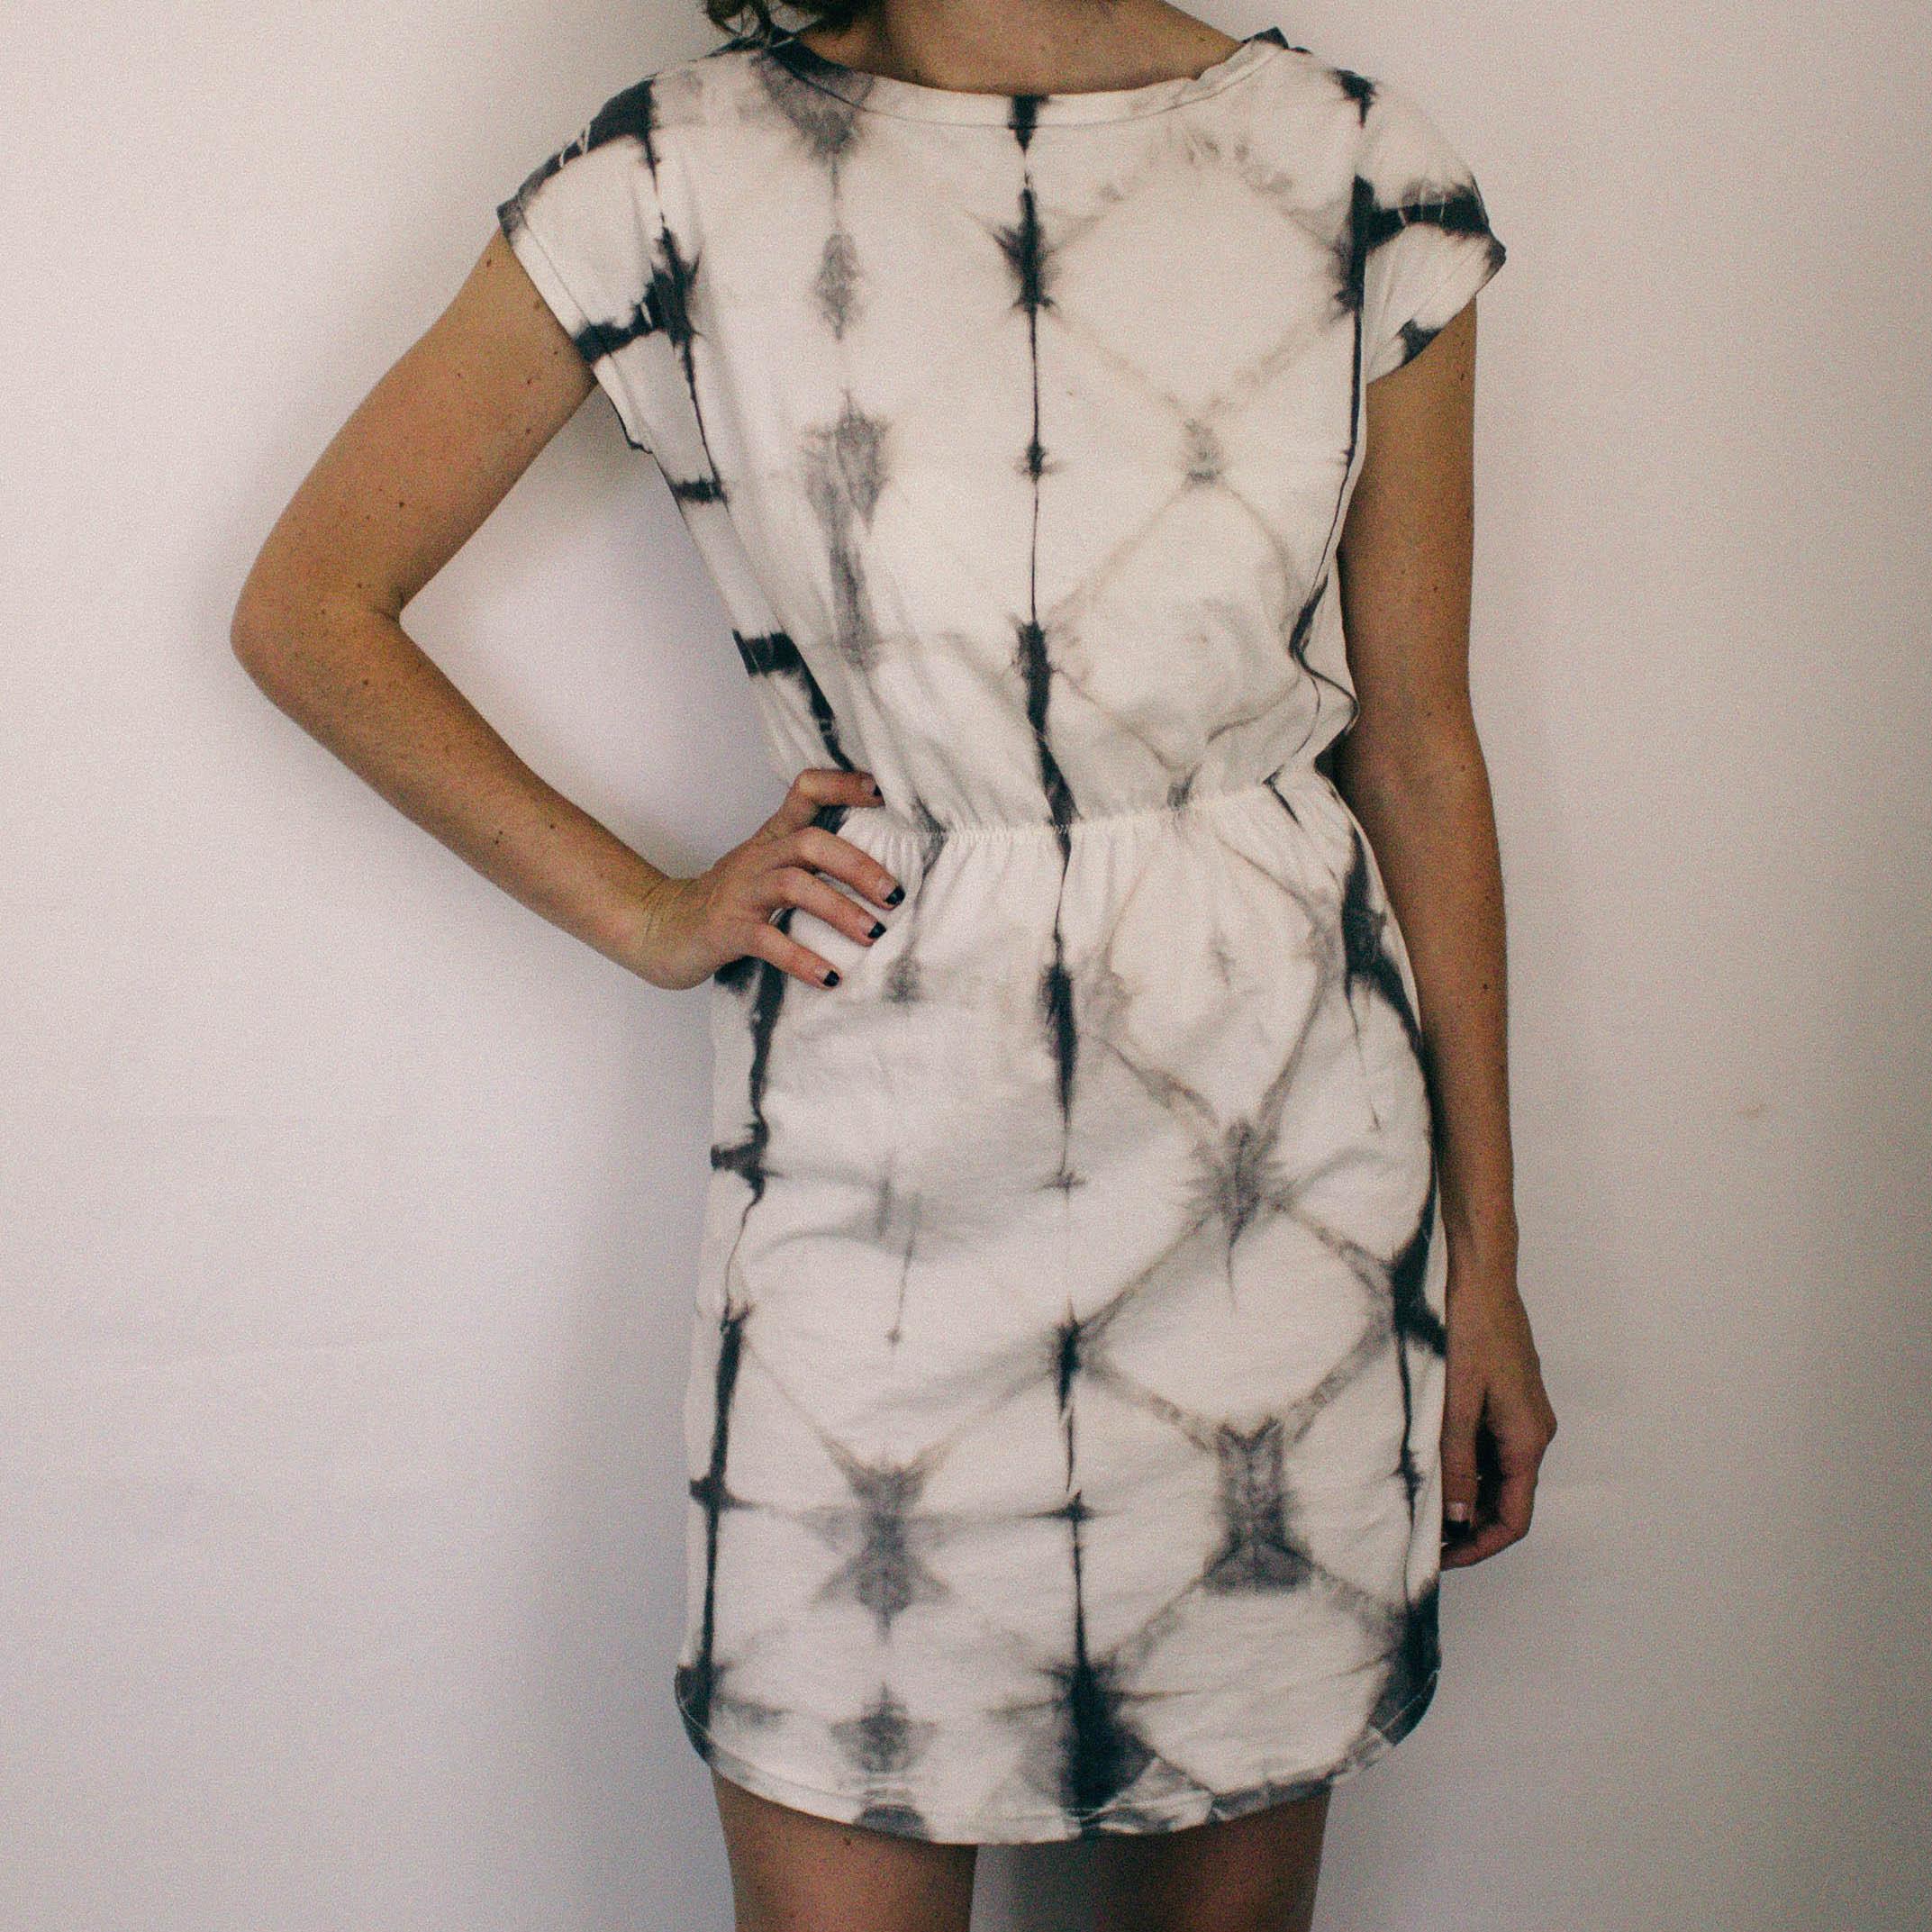 Organic Shibori Shirtdress // Natural Acorn Dye // $68